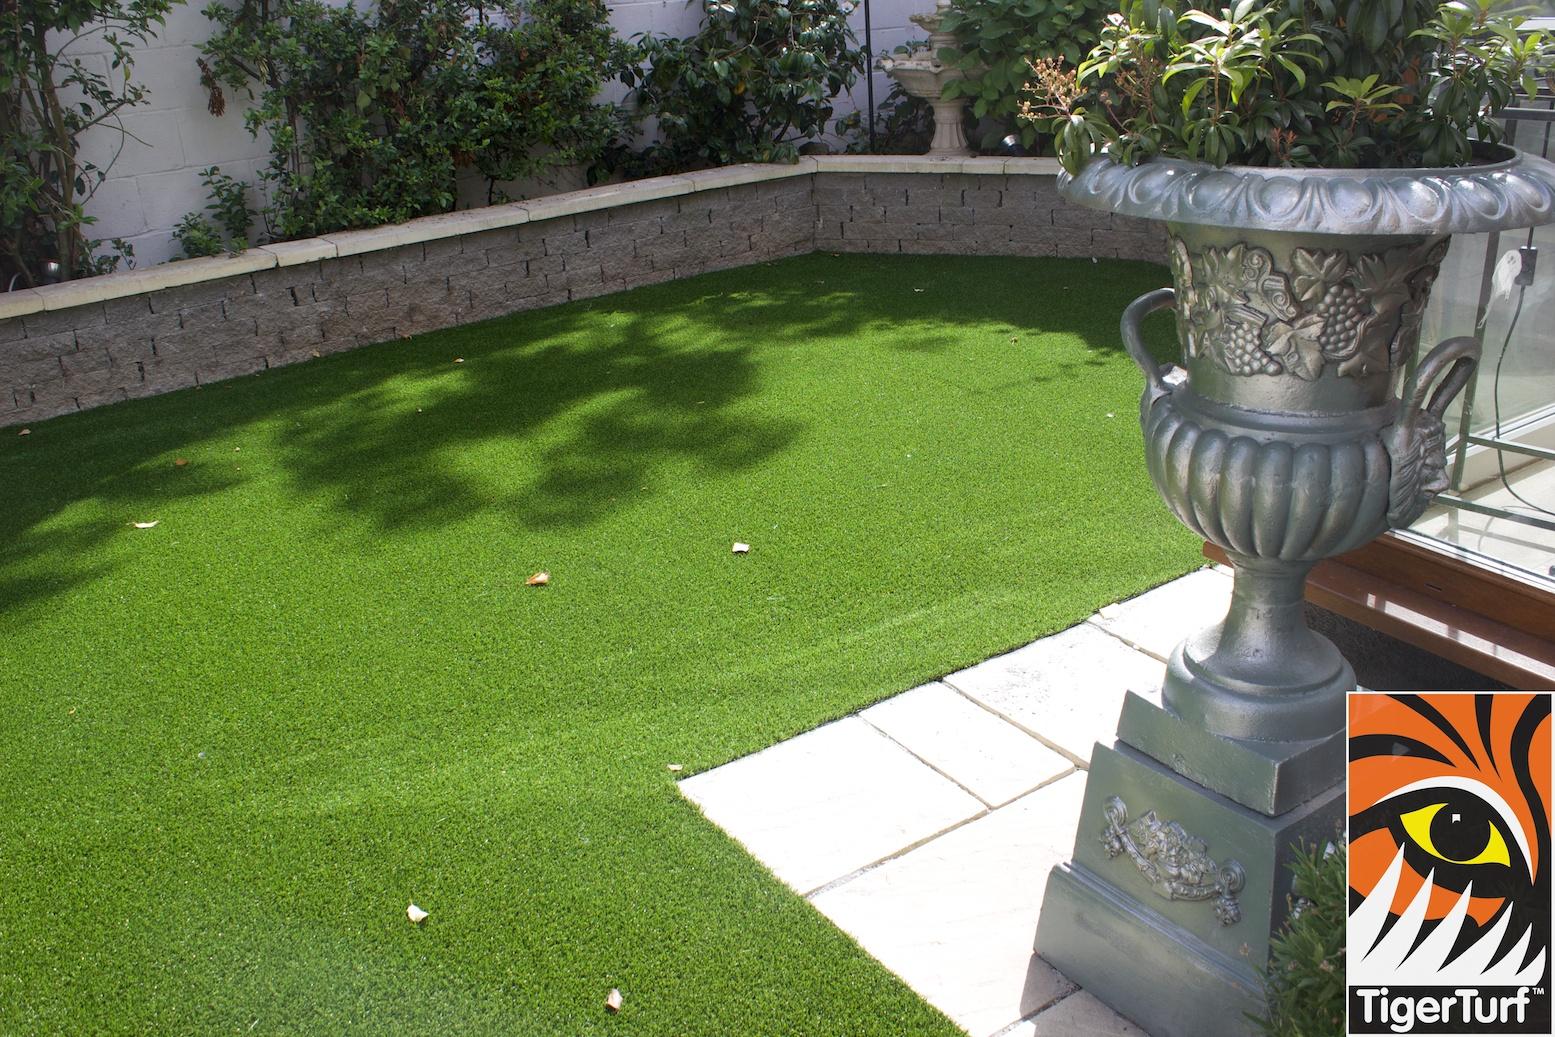 TigerTurf Grass installation